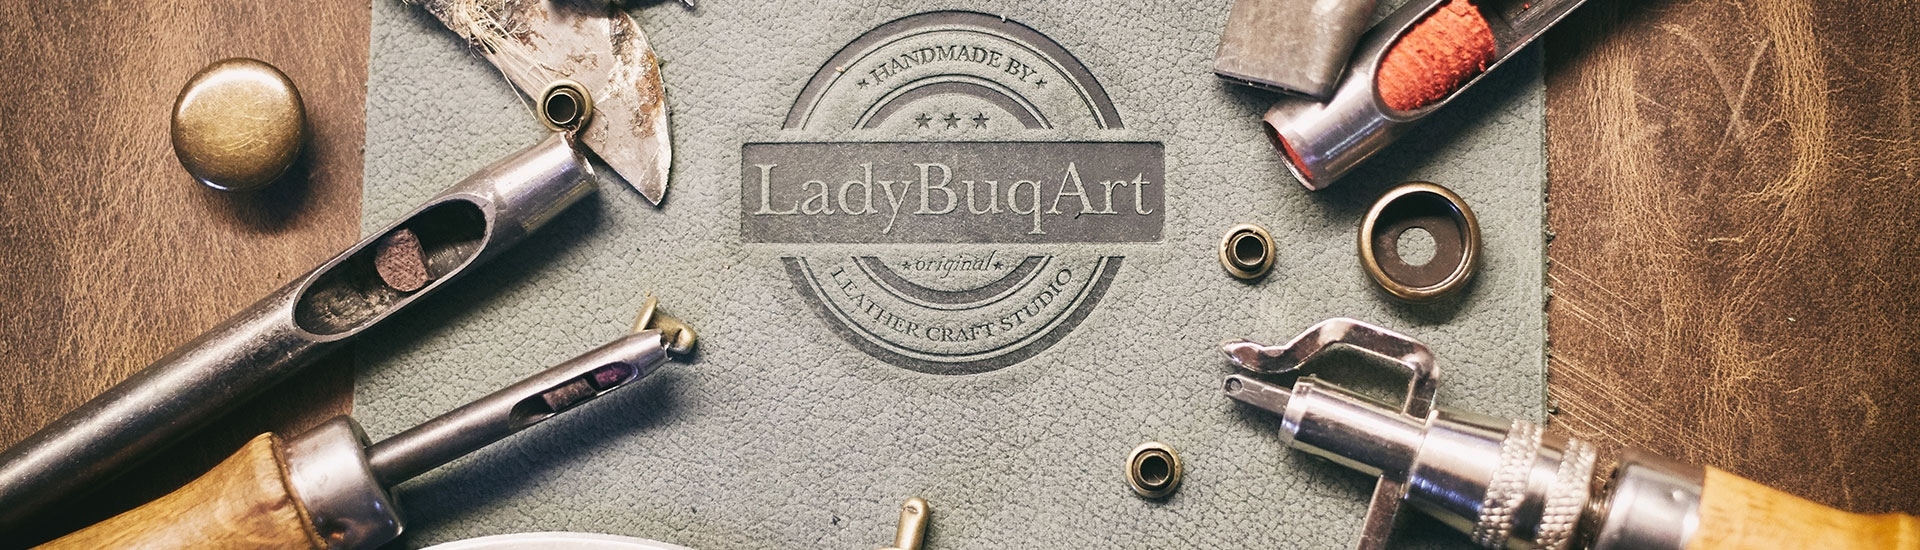 Ladybuq